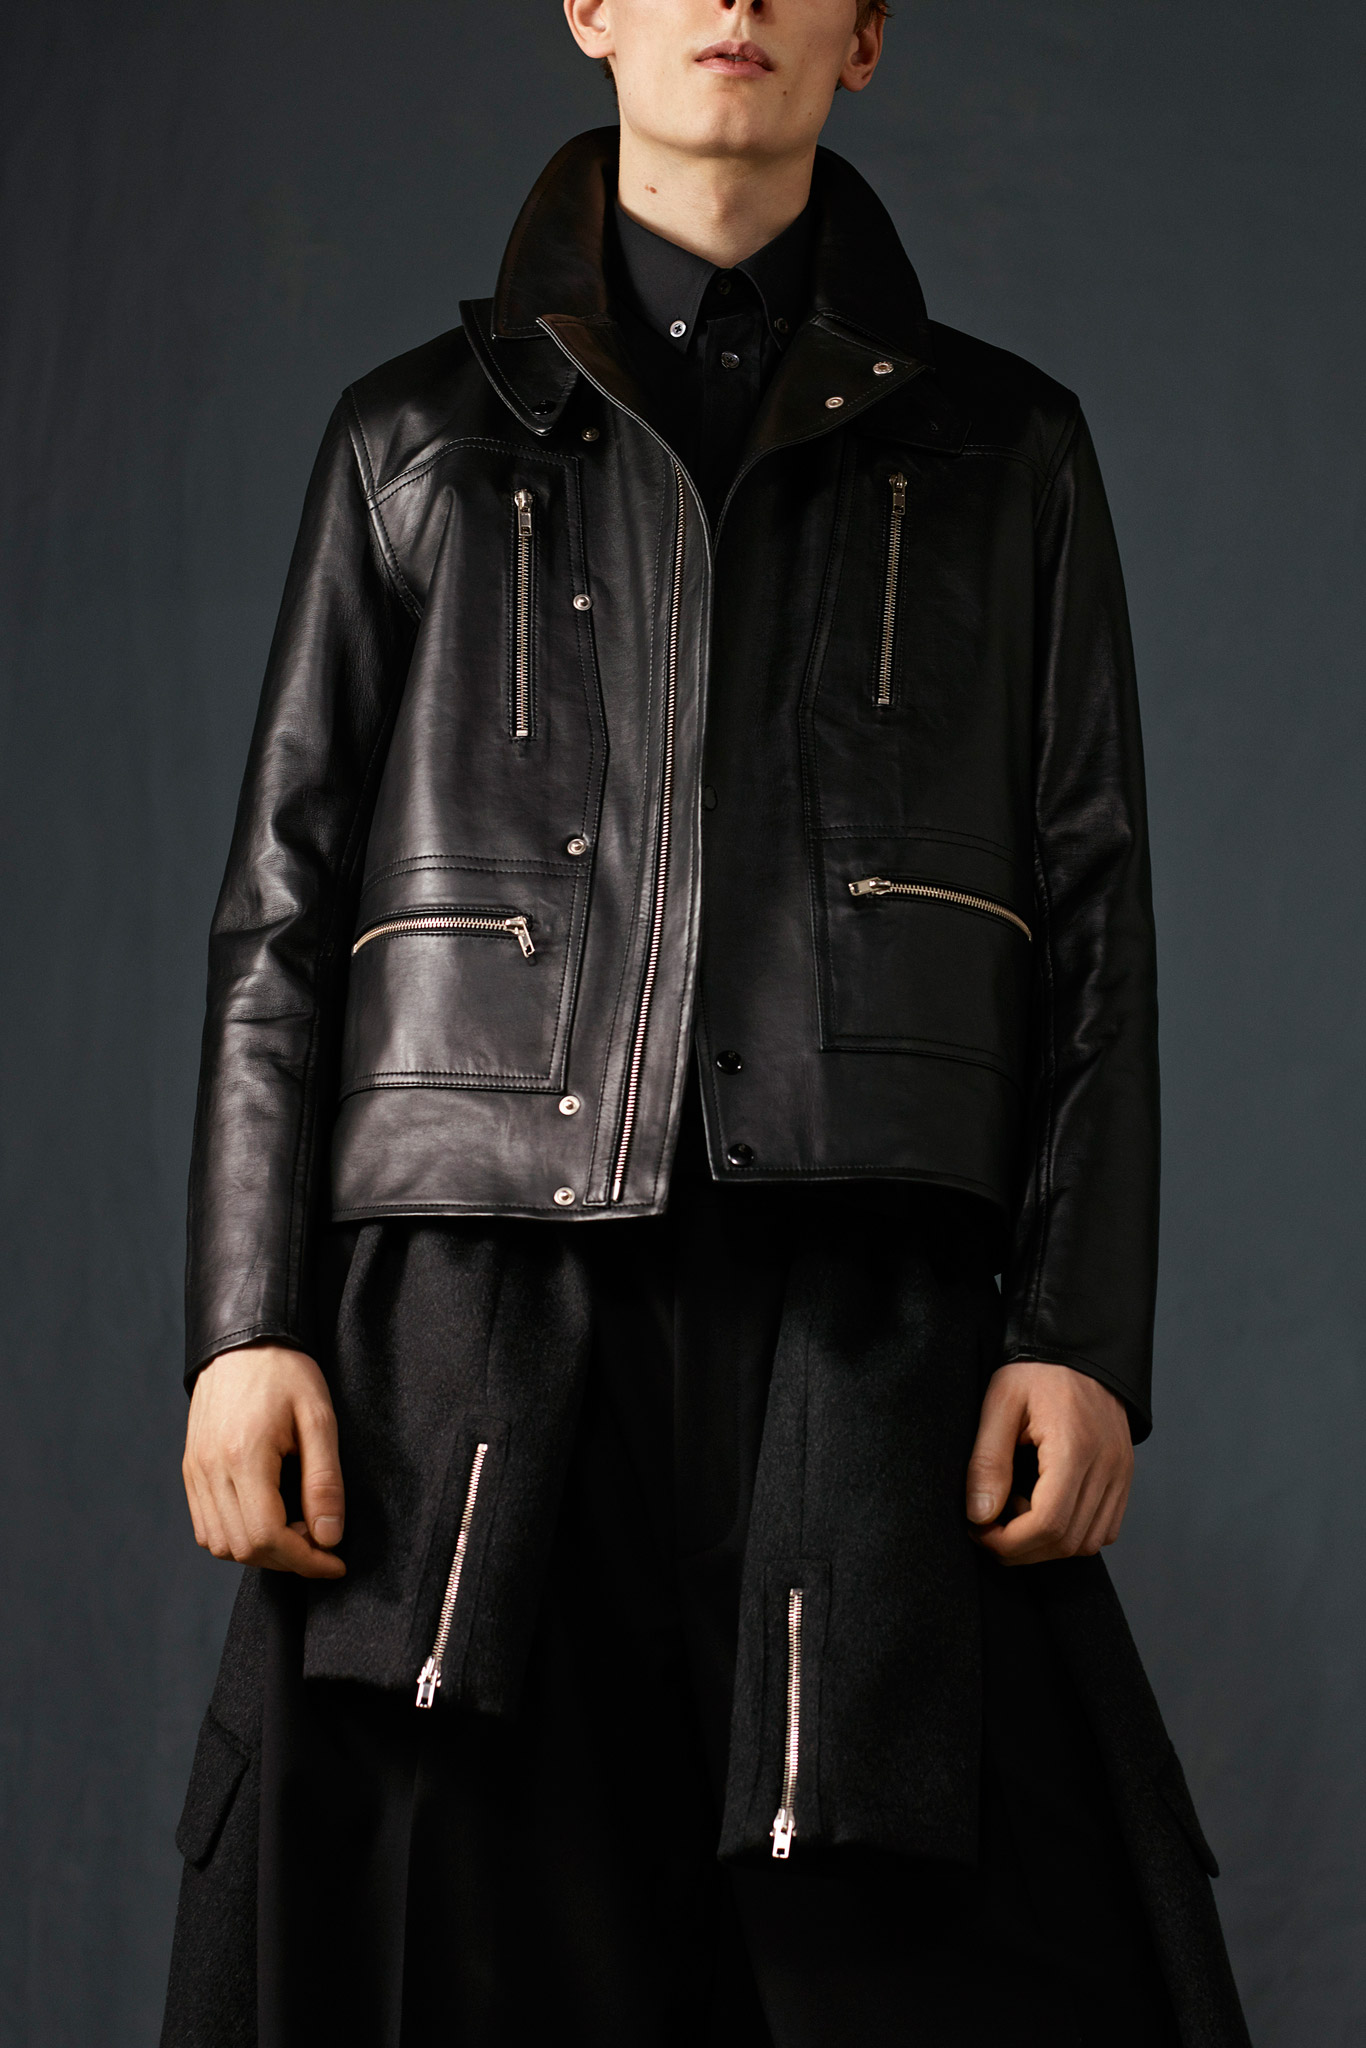 McQ Alexander McQueen Menswear FW 2015